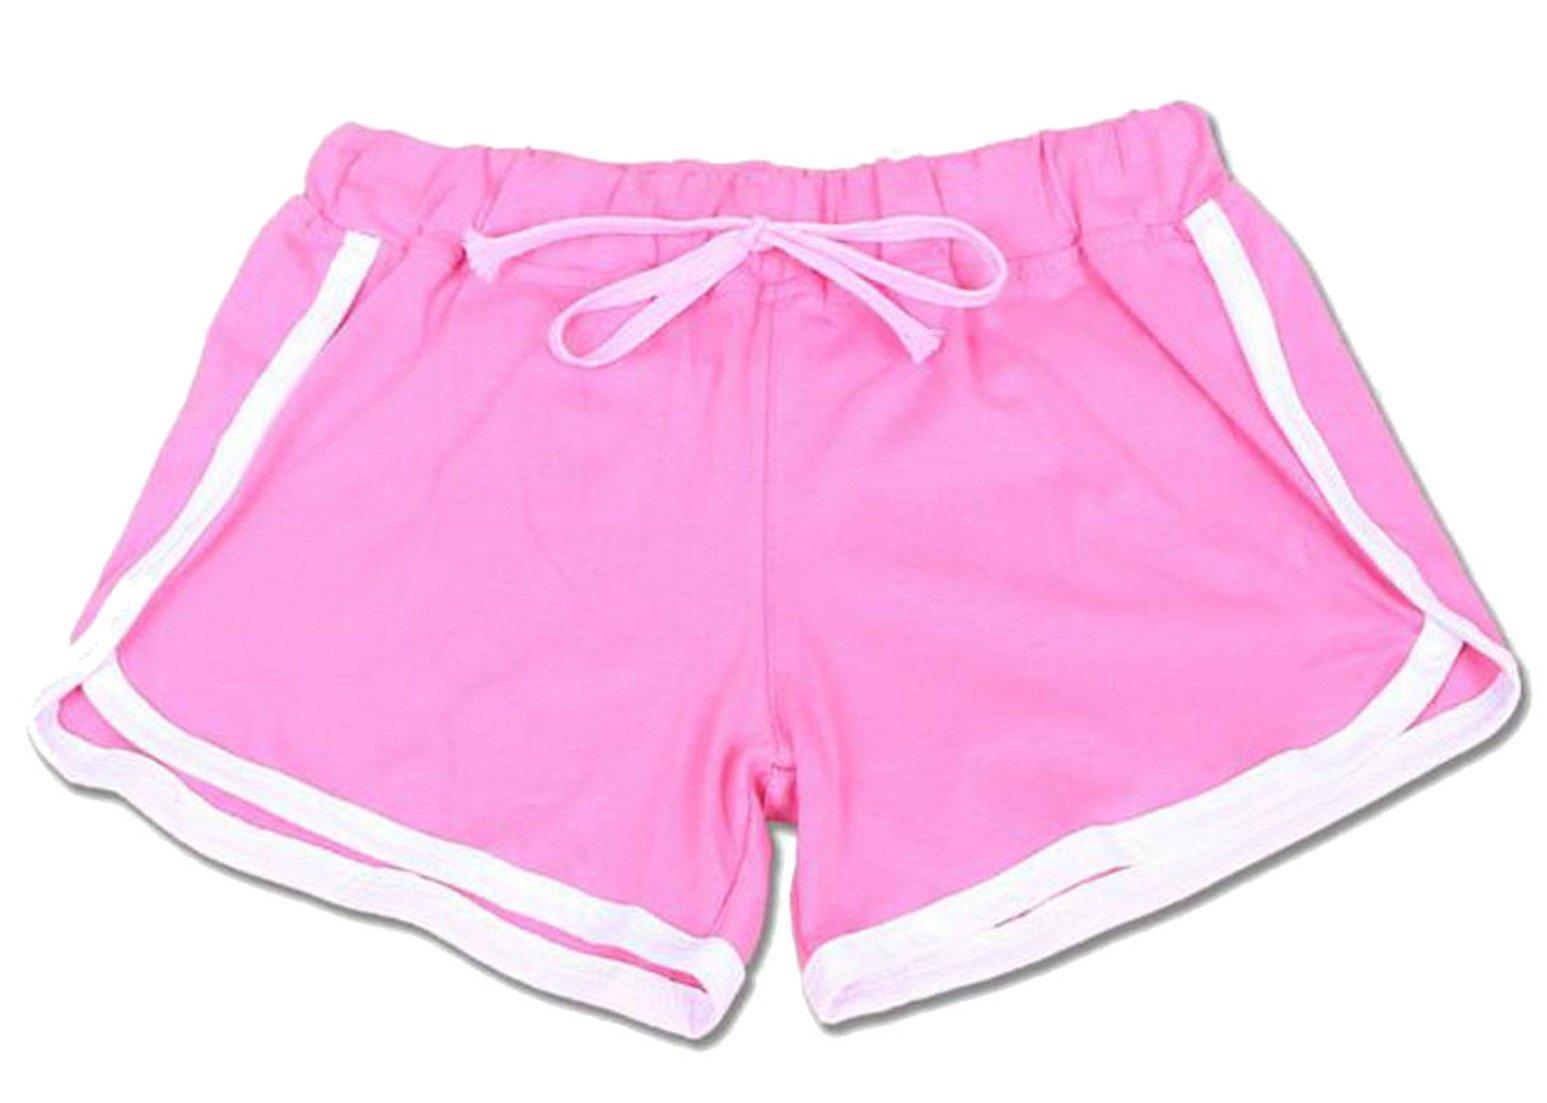 Wofupowga Womens Elastic Waist Casual Slim Track Summer Sport Hot Shorts Pink Medium